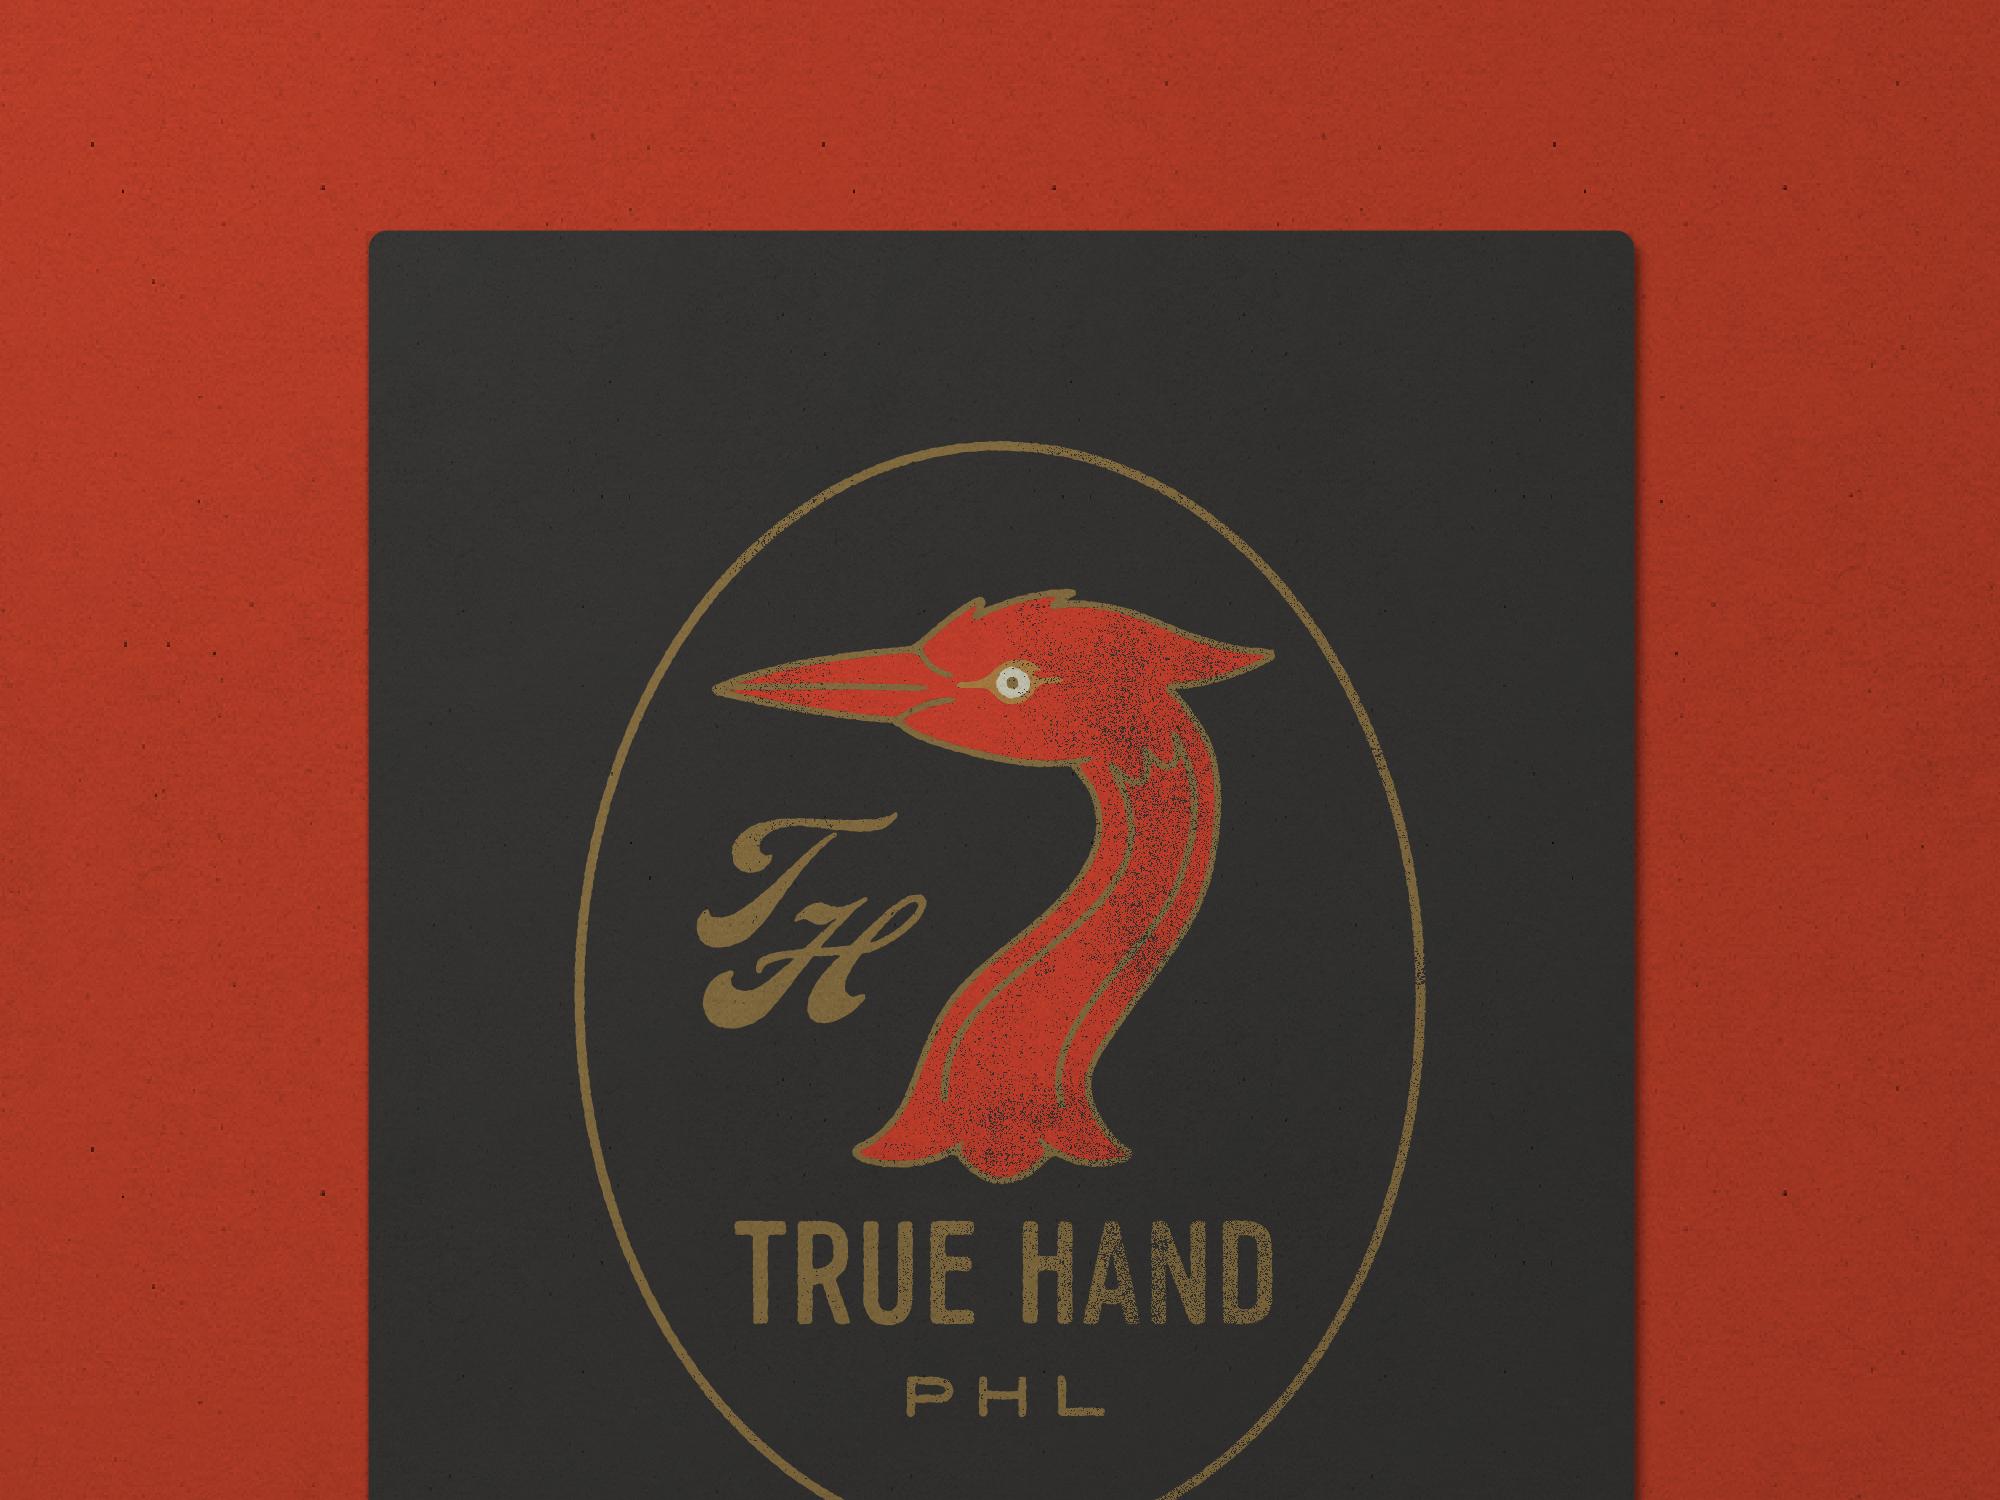 Nº 029 | Jessie Jay Design For True Hand